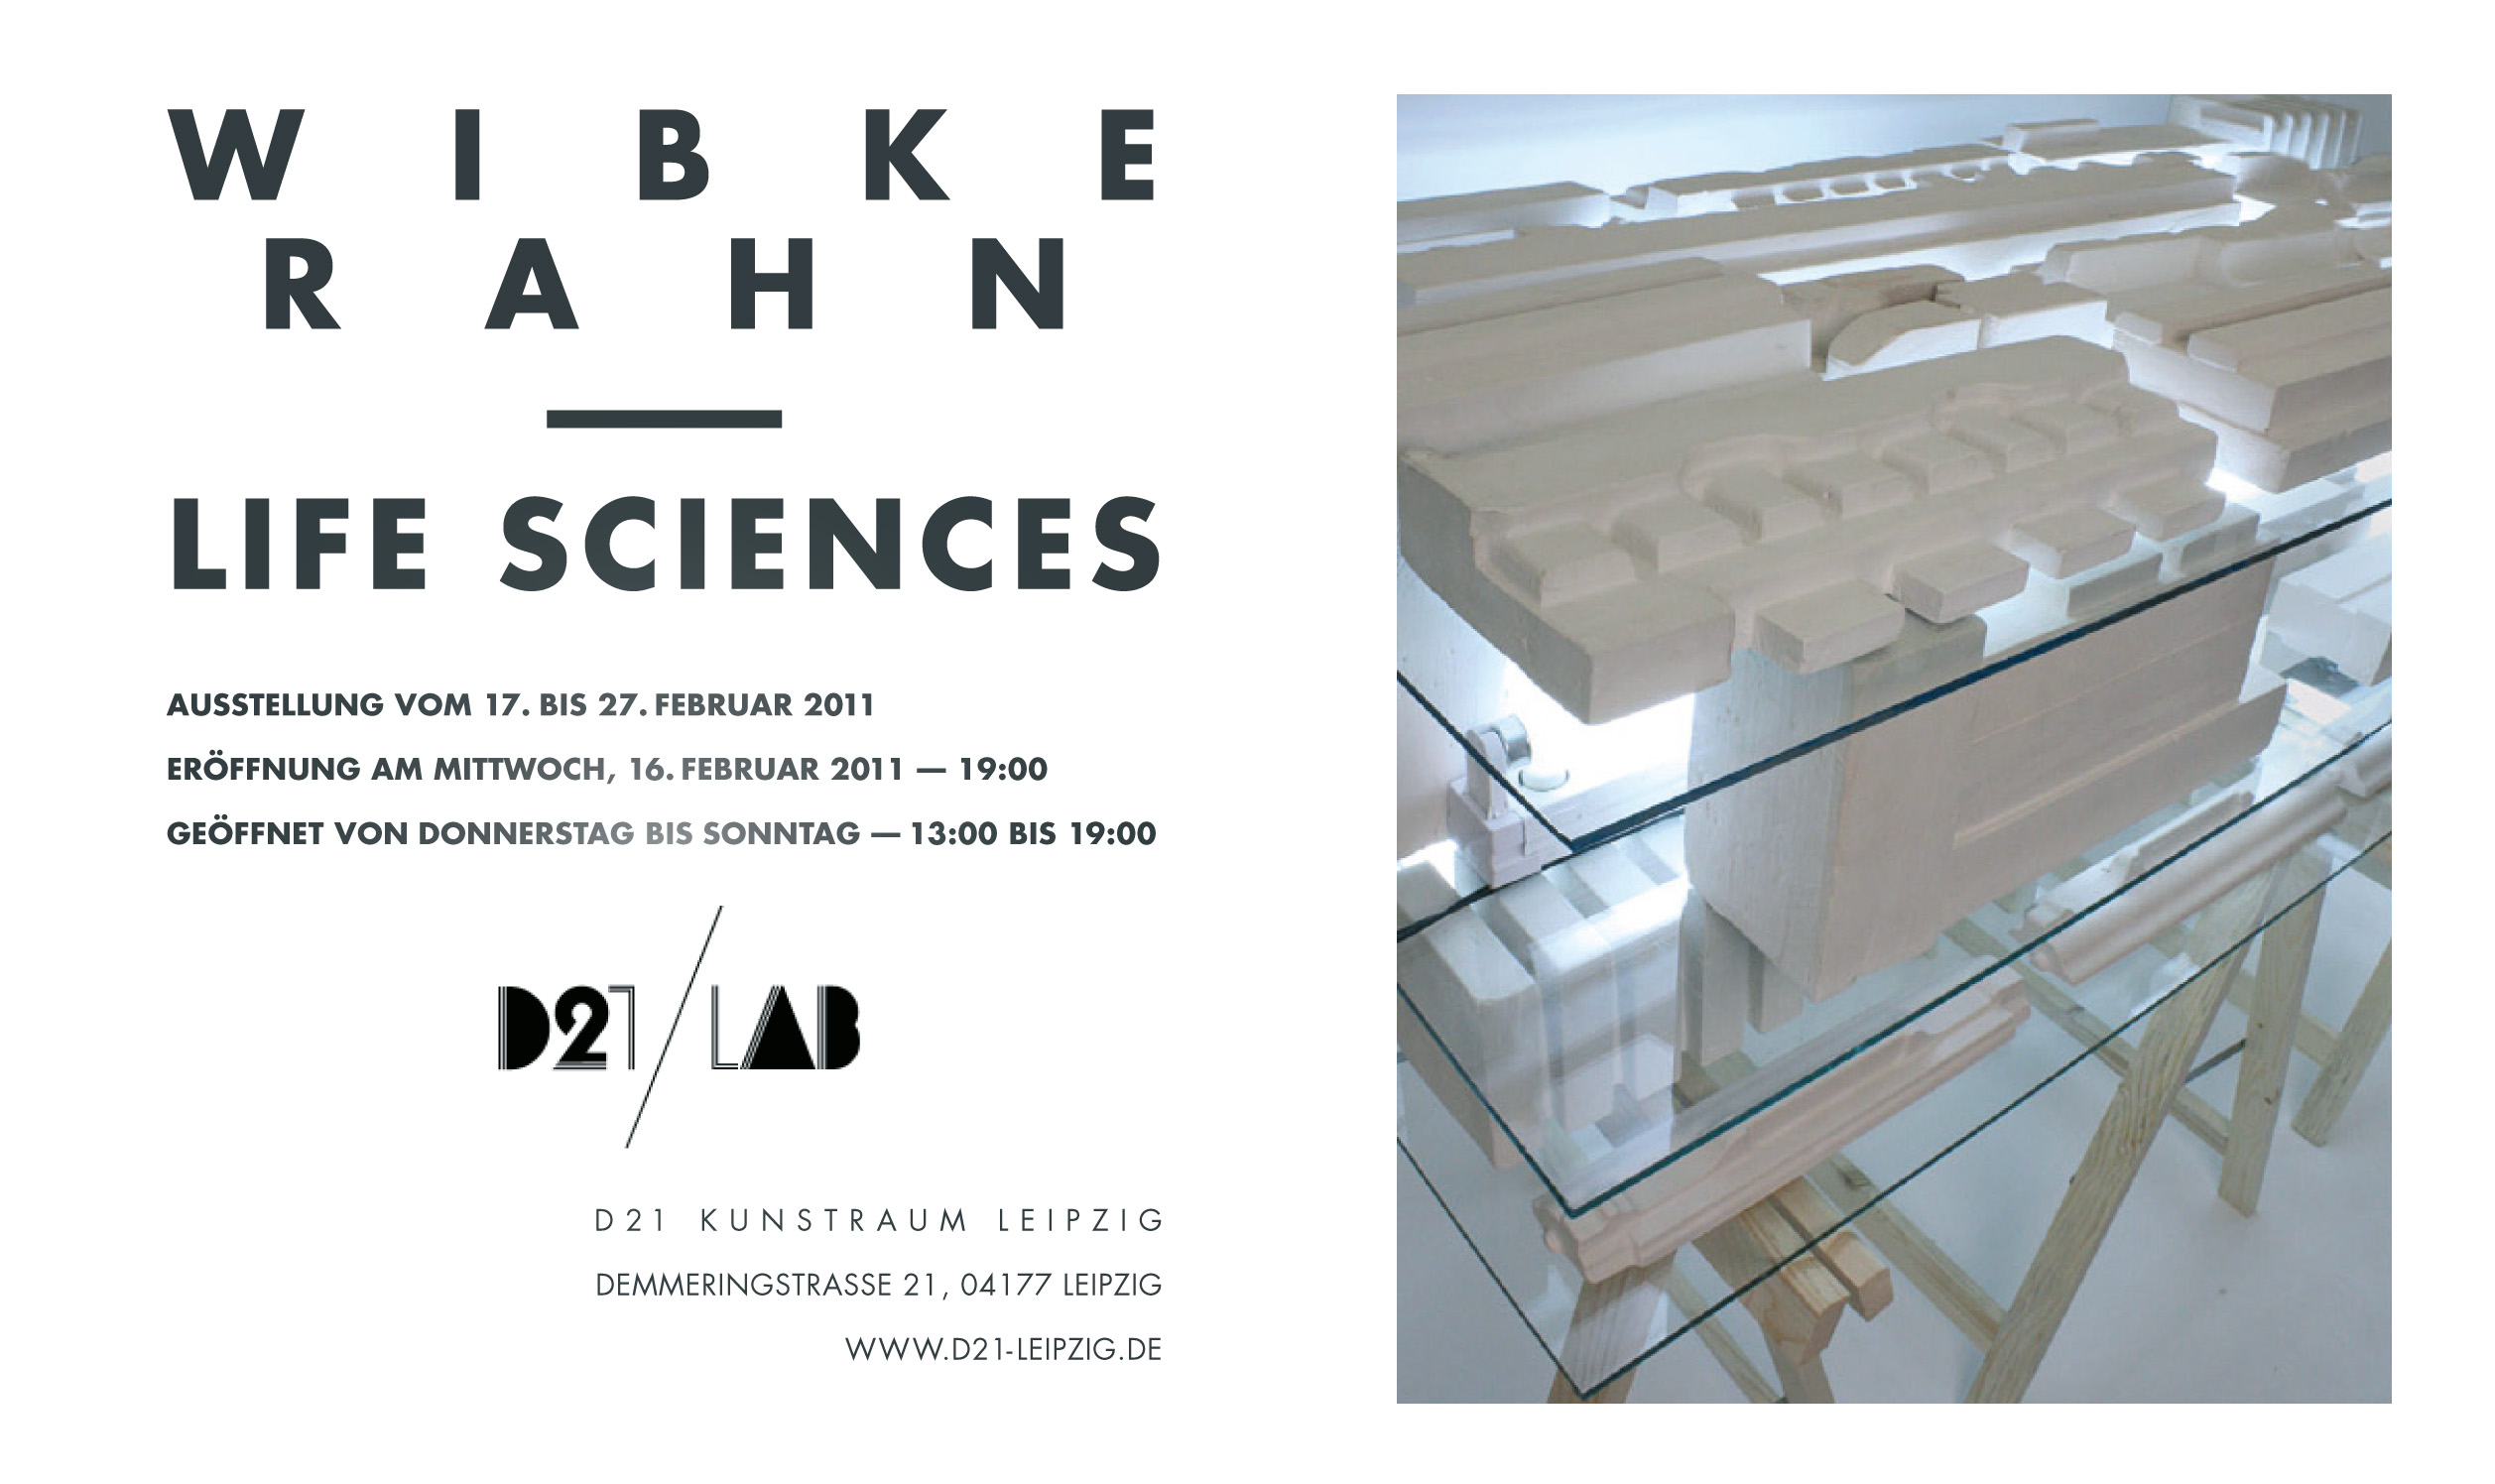 Kunstraum D21 Lab Life Sciences